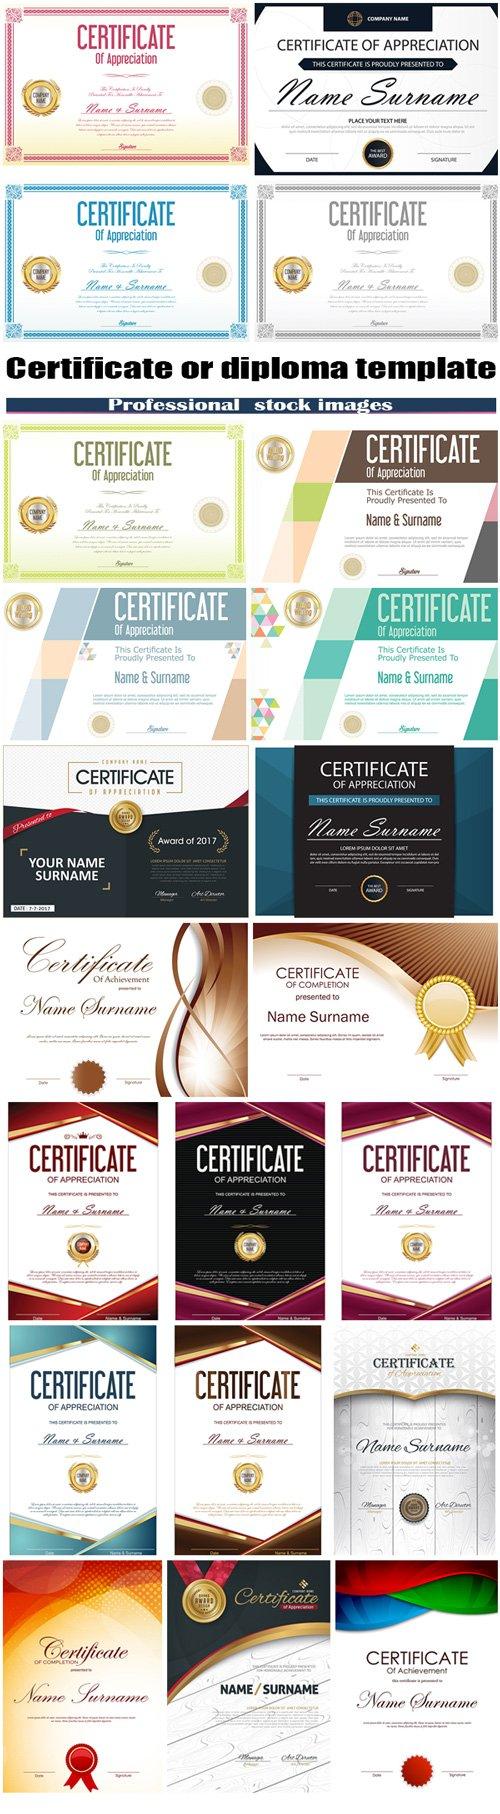 Certificate or diploma template #2